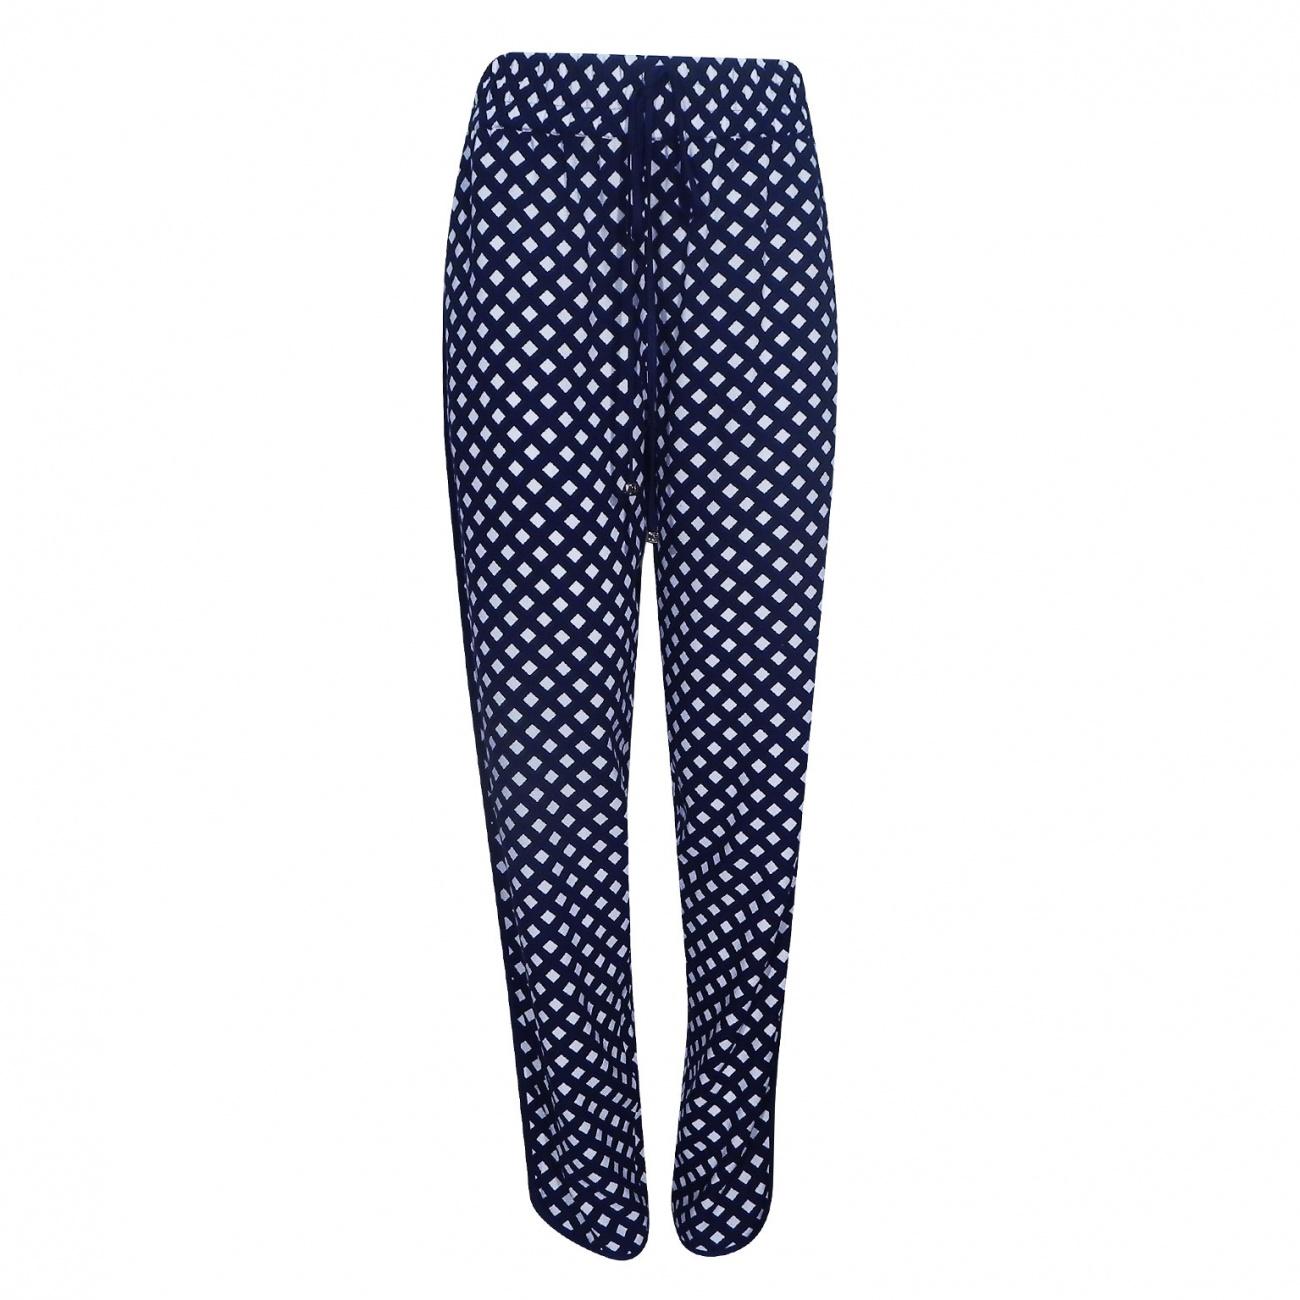 9fa7c81ff Calça Pijama Vinco Lateral Cholet - Pole Modas